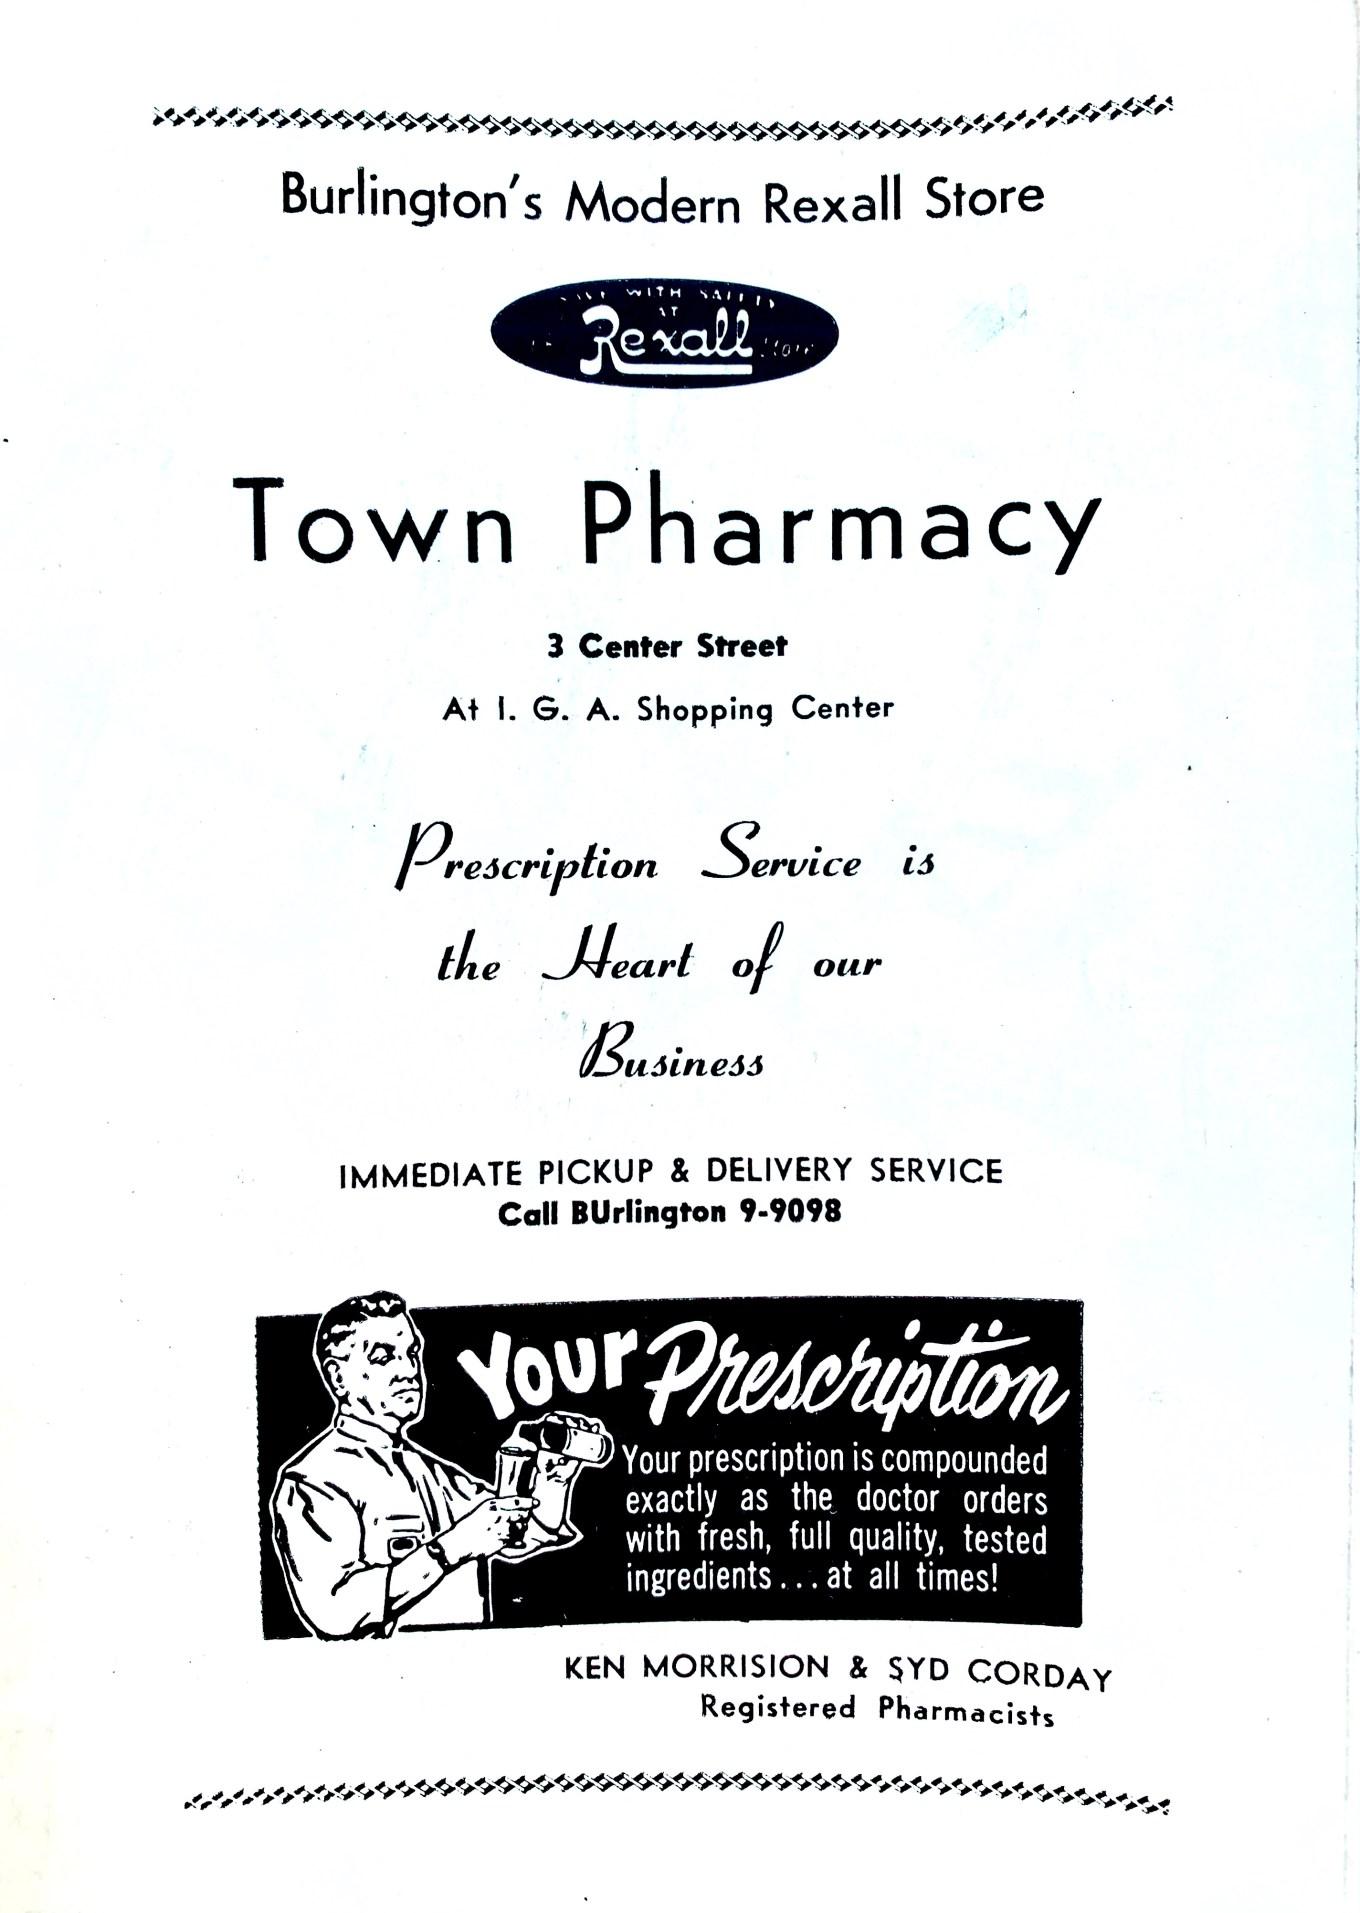 Town Pharmacy/Rexall ad 1956 Burlington MA